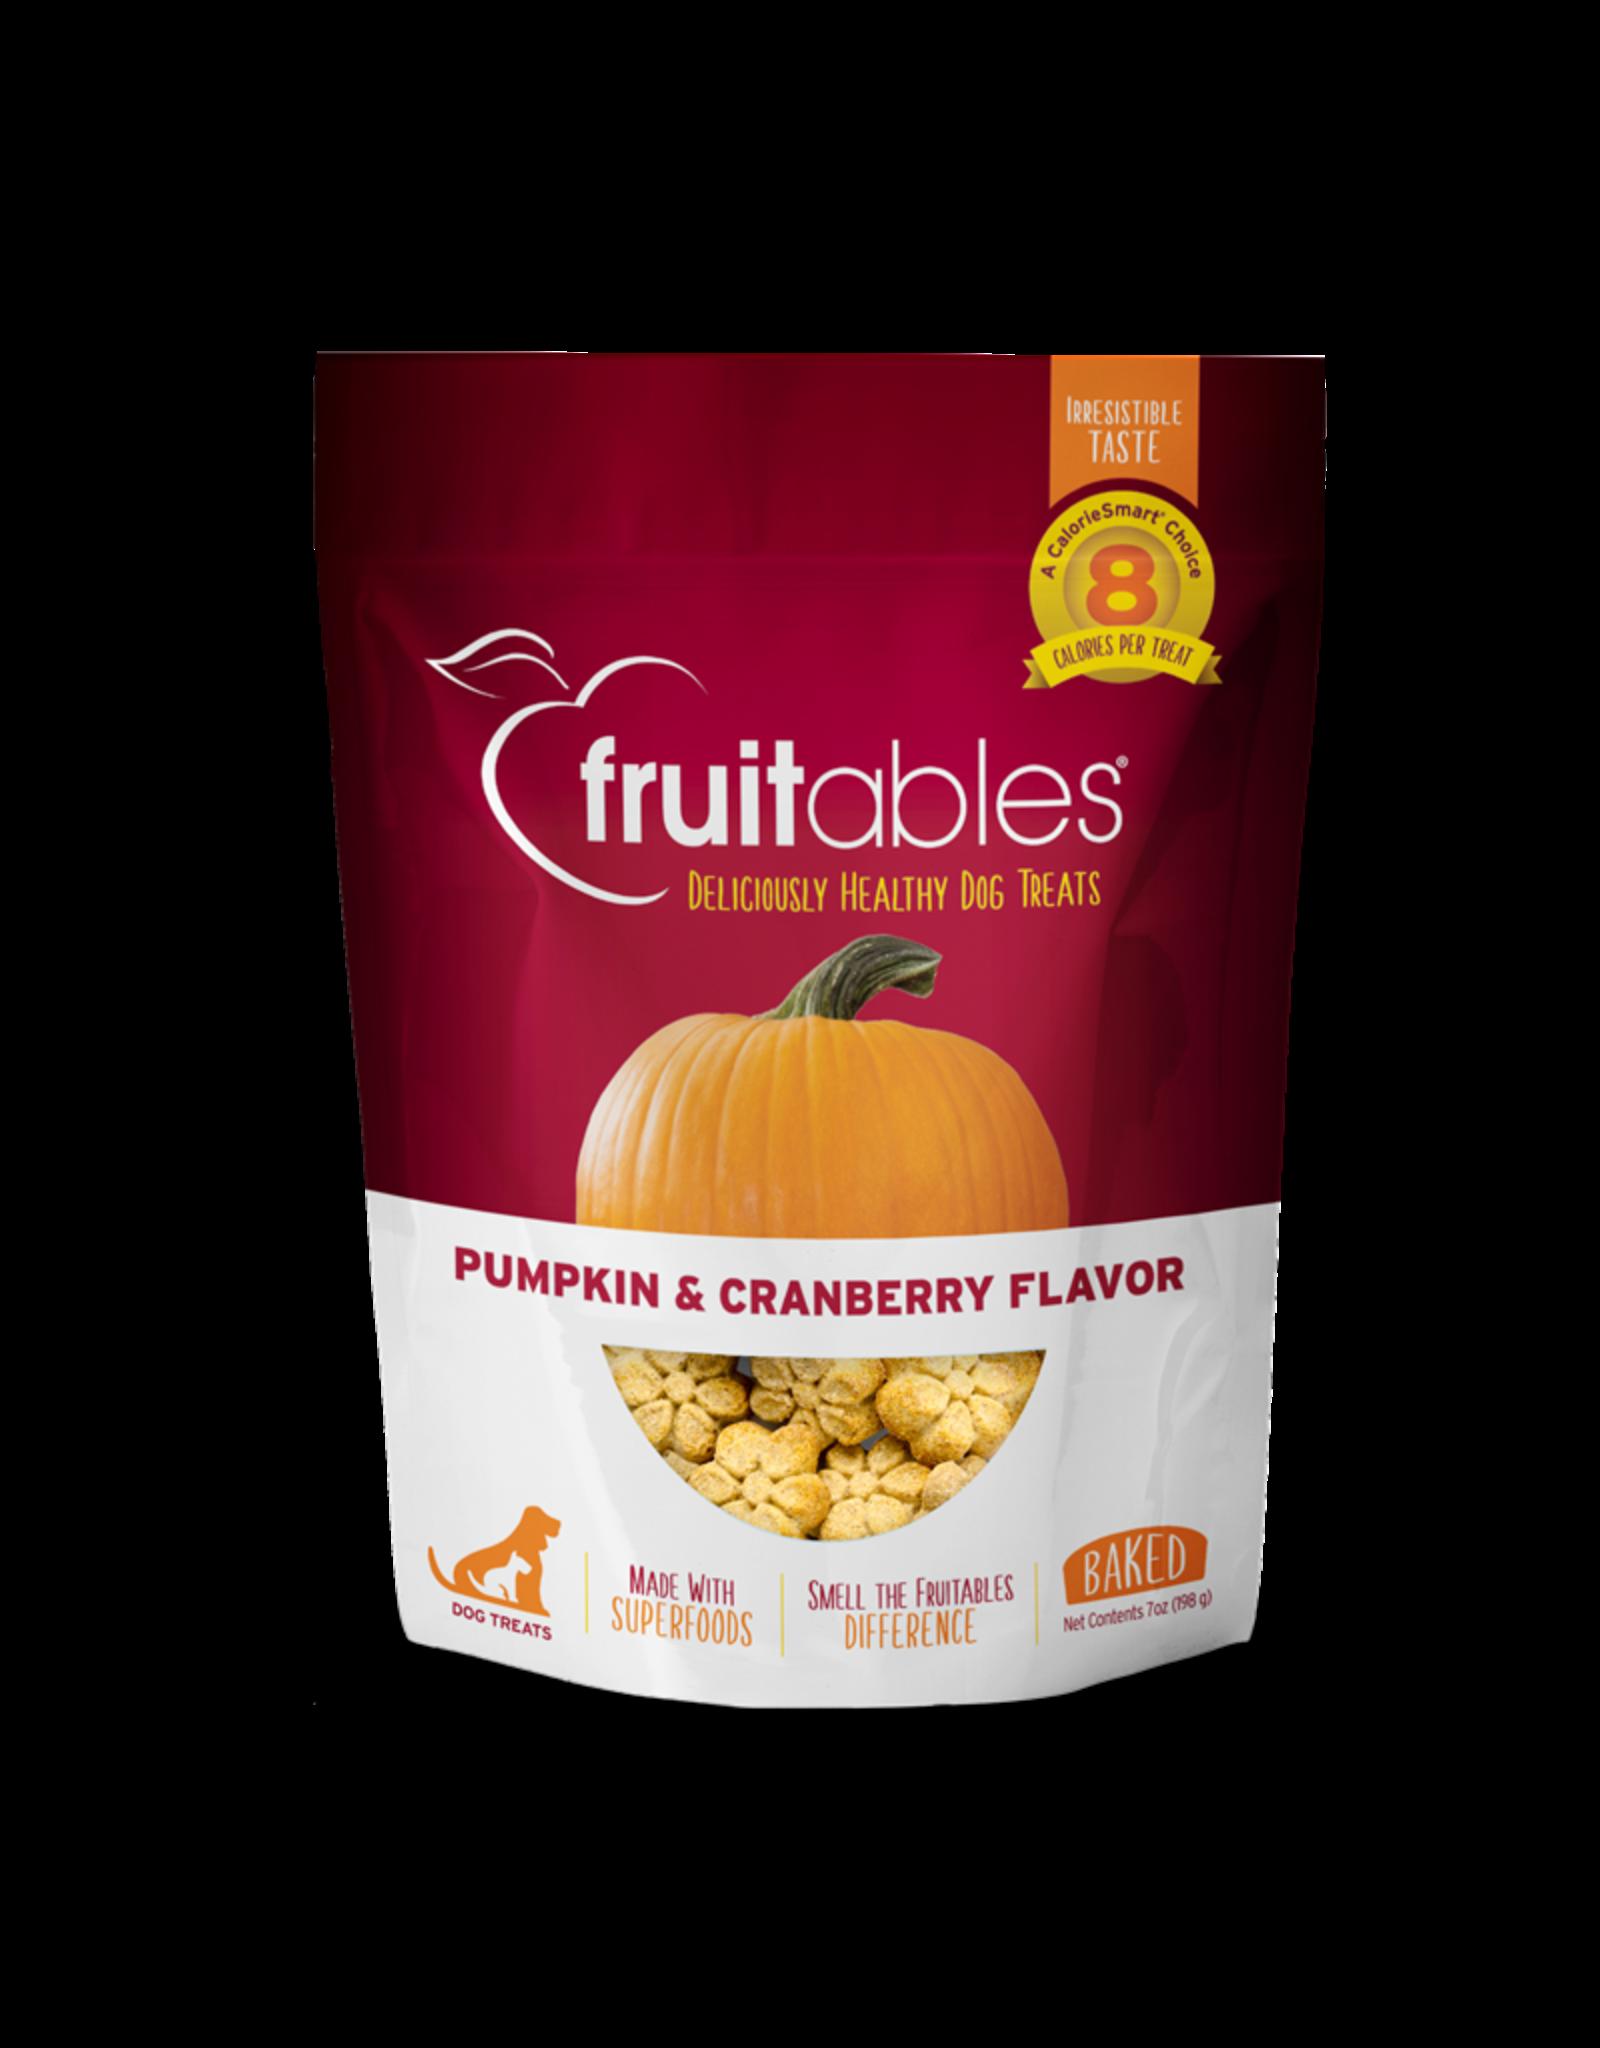 Fruitables Fruitables Crunchy Baked Dog Treats